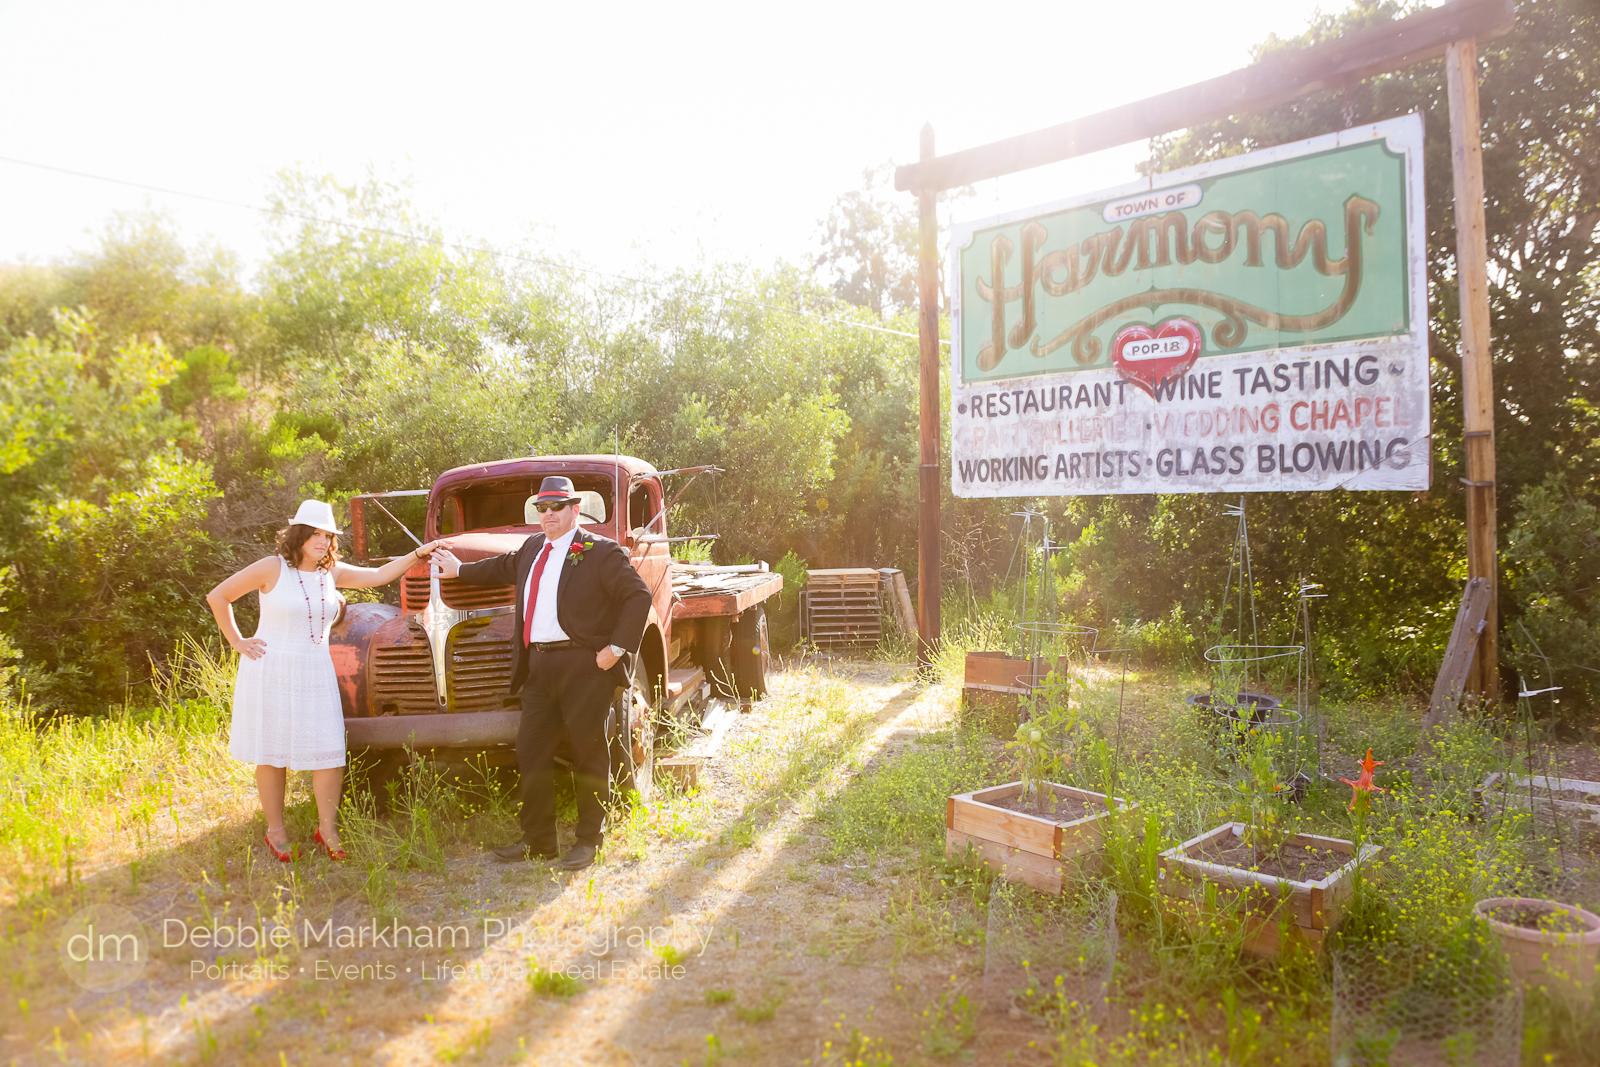 Debbie-Markham-Photography_Small-Town-Wedding_Destination-Wedding_California_Central-Coast-2054.jpg